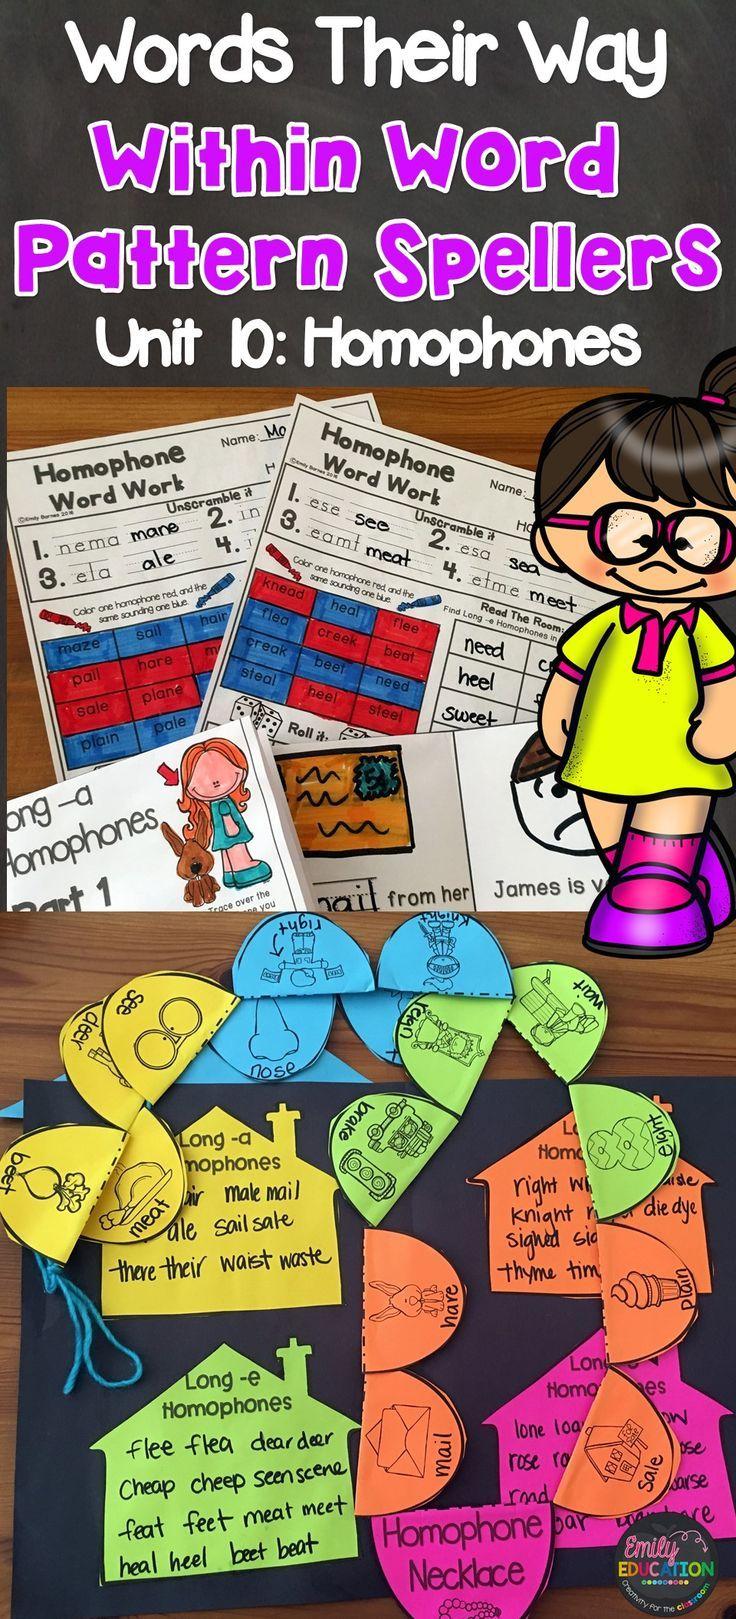 Words Their Way Within Word Pattern Spellers Unit 10: Homophones Activities Galore!!!